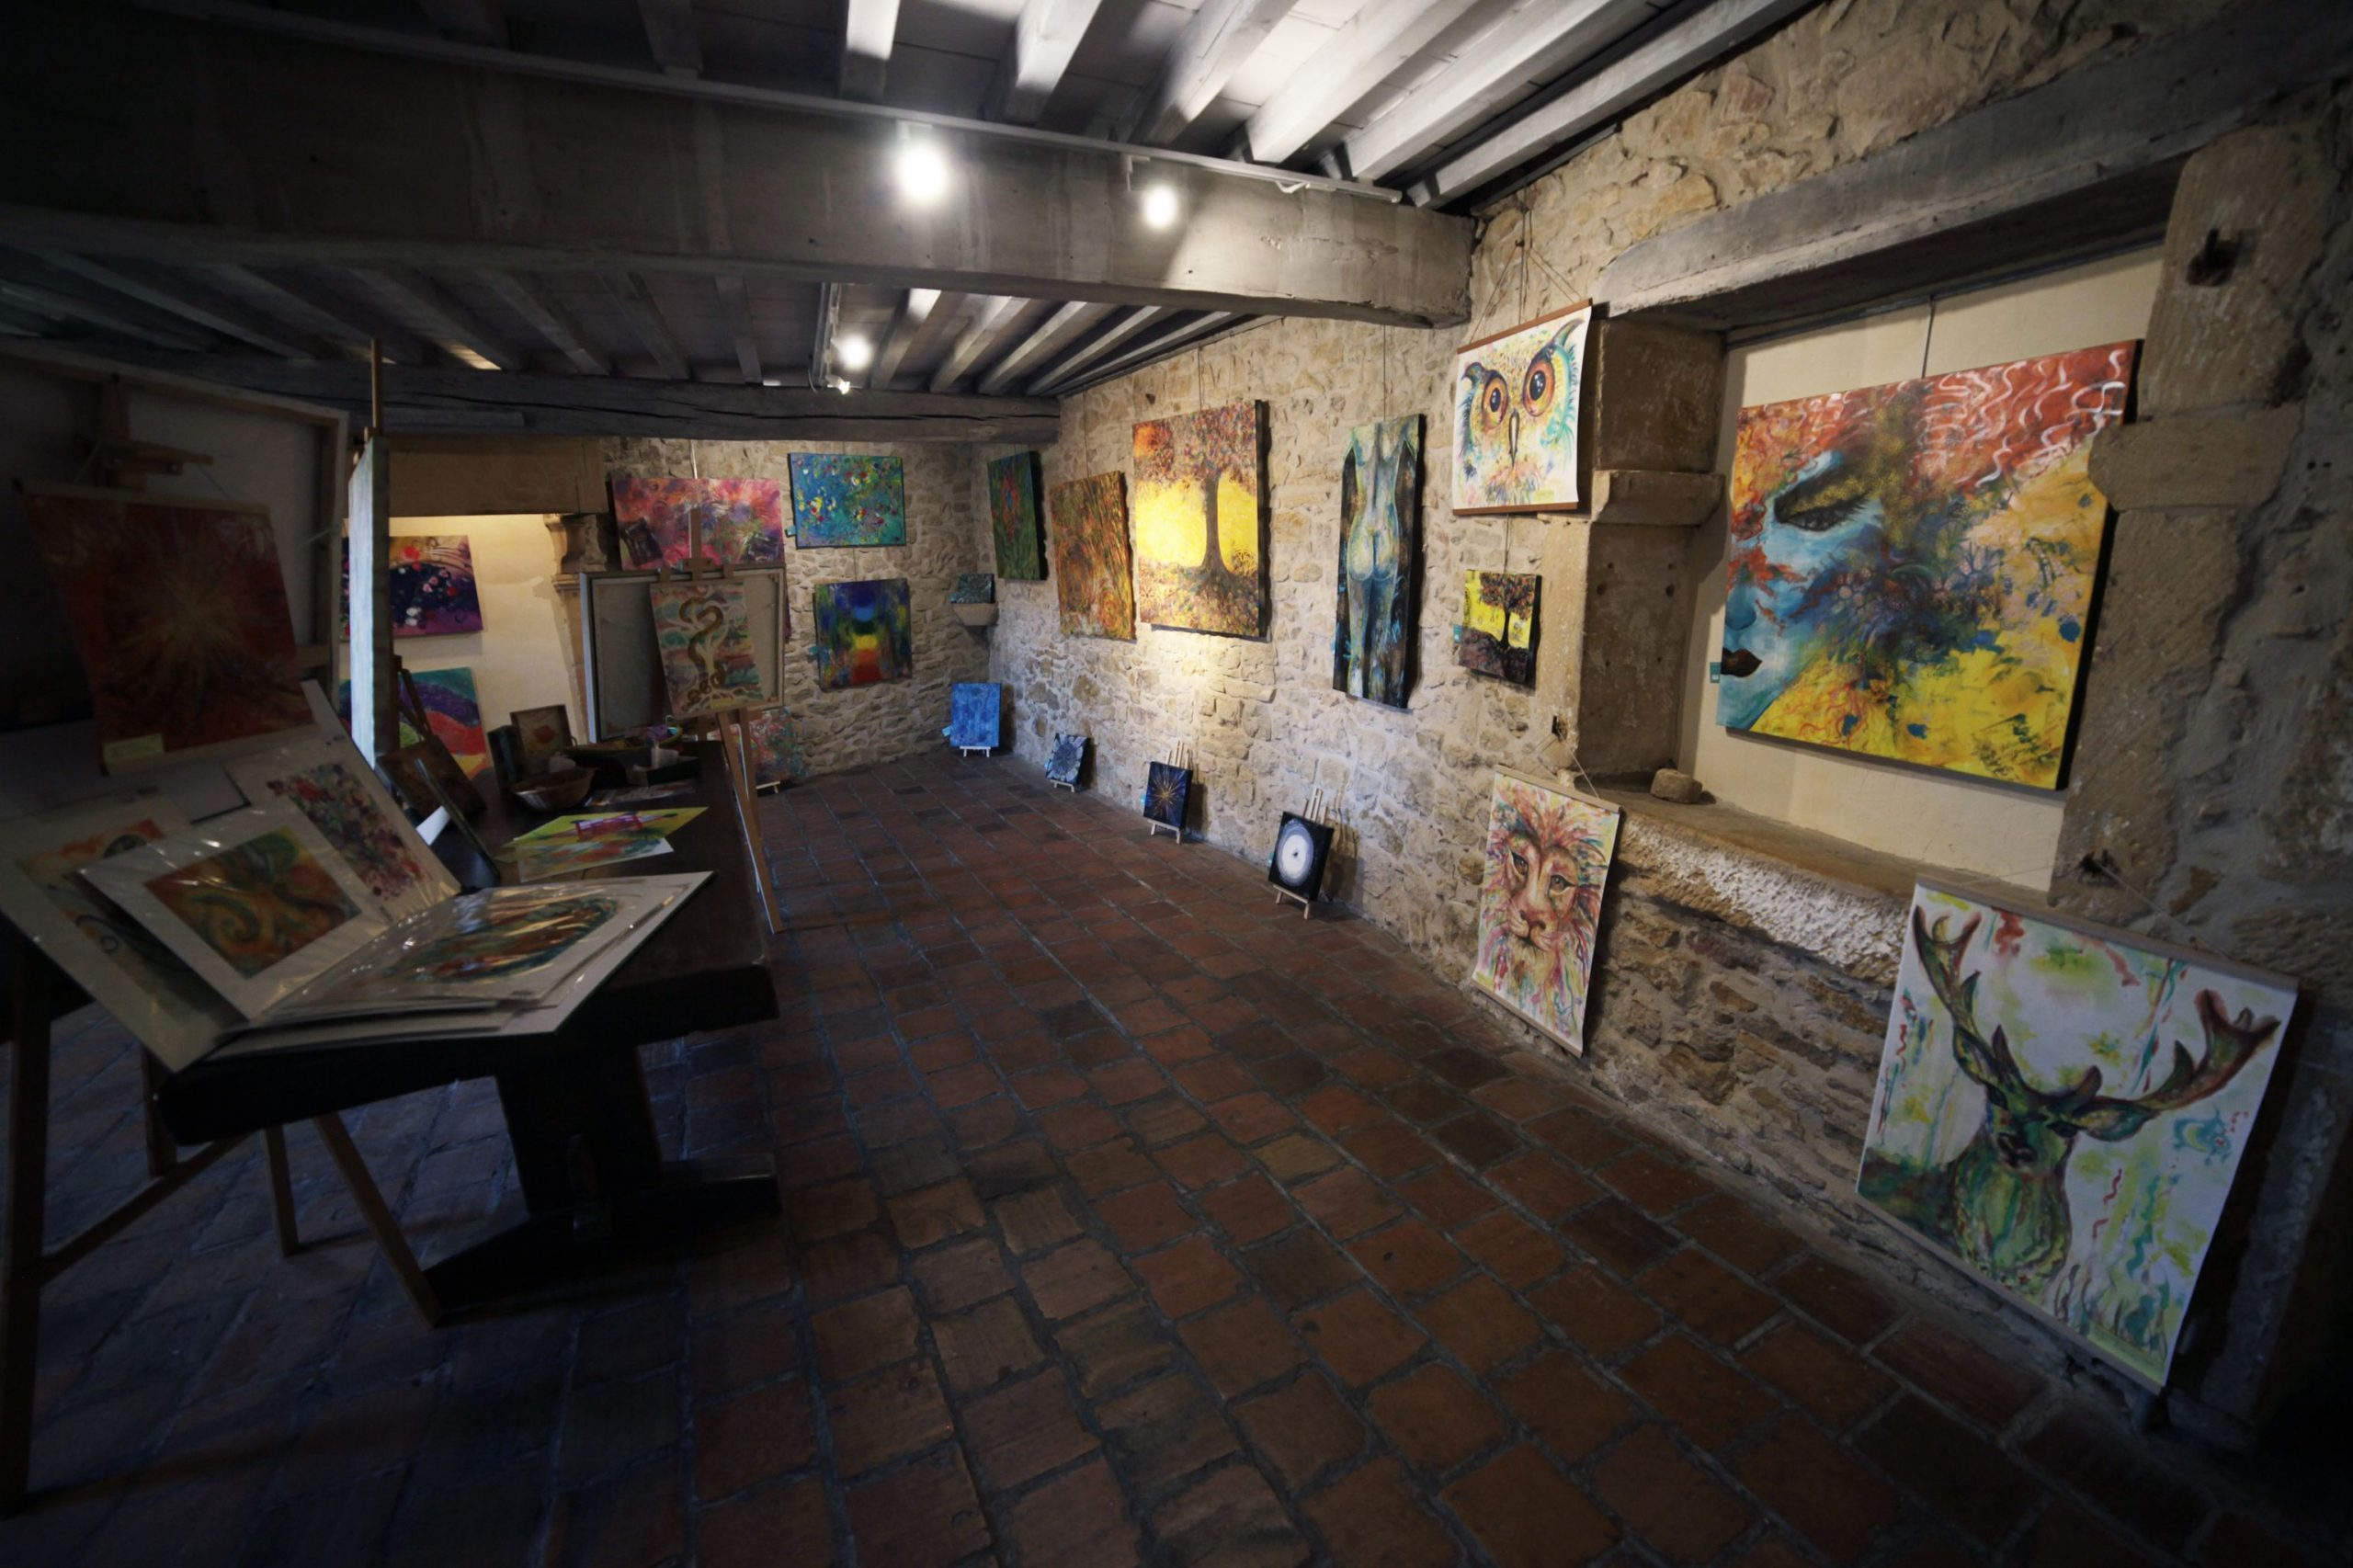 exposition peintures, exposition, peinture, peinture énergétique, peinture vibratoire, peinture d'âme